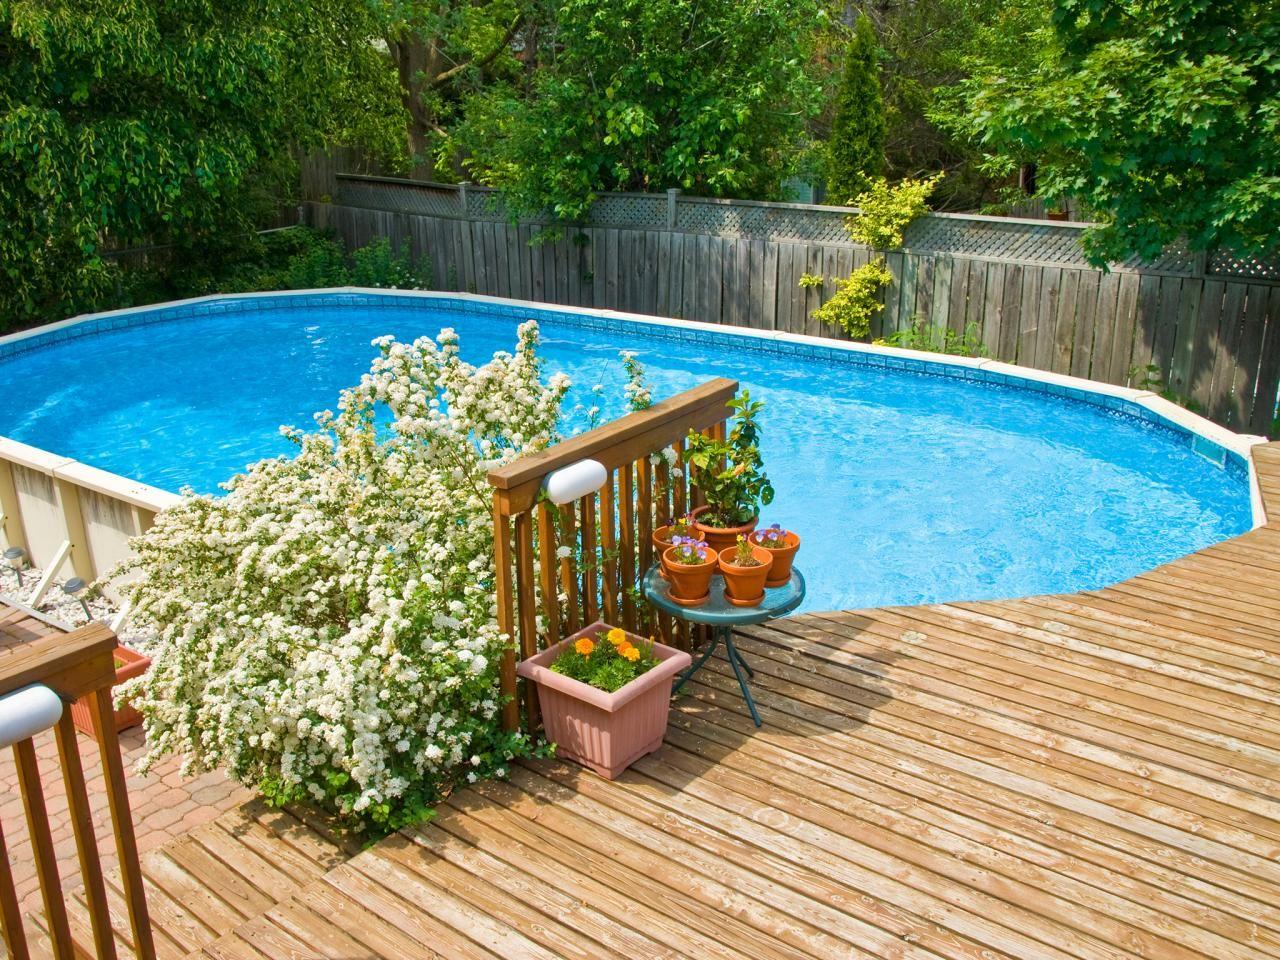 Above-Ground Pool Decks | Ground pools, Deck patio and Hgtv